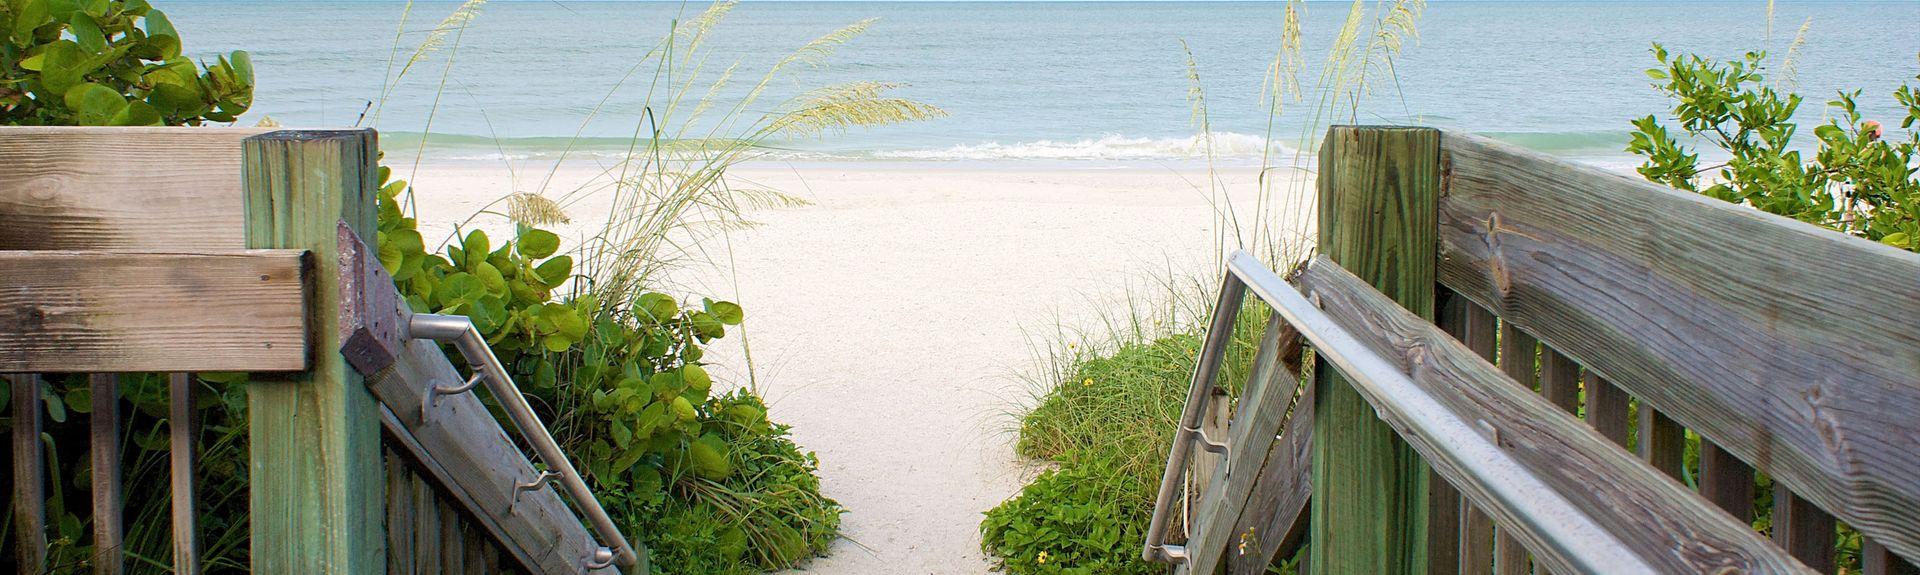 Bonita Springs Public Beach, Bonita Springs, Florida, Forente Stater